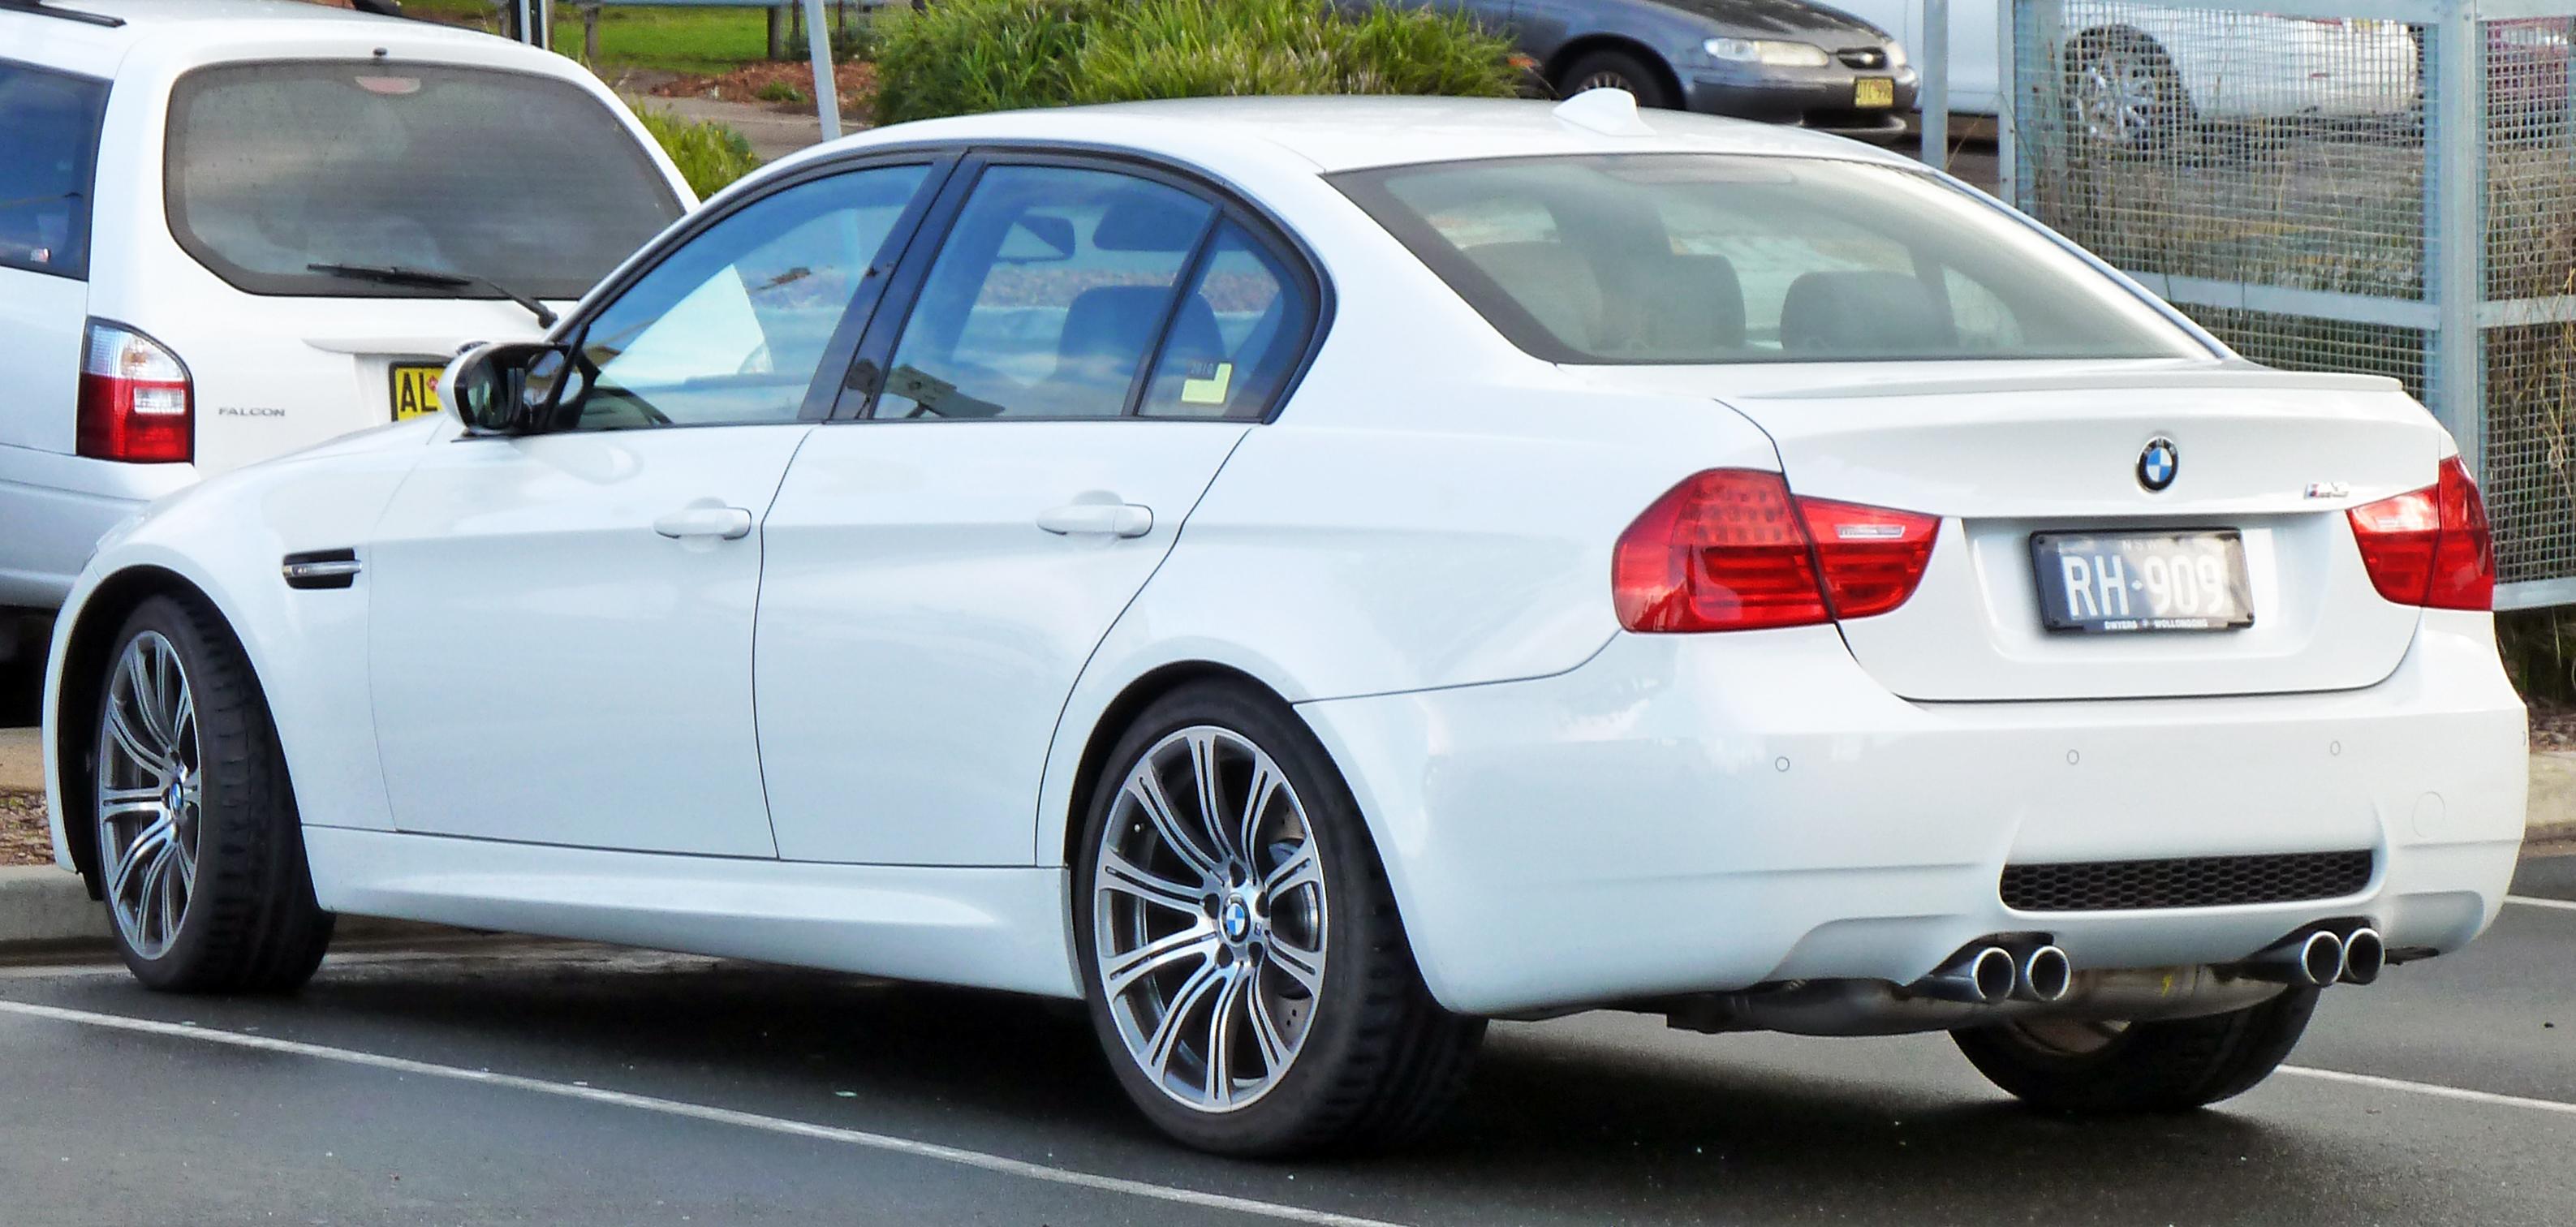 Bmw E90 Wiki >> File:2008-2010 BMW M3 (E90) sedan 02.jpg - Wikimedia Commons